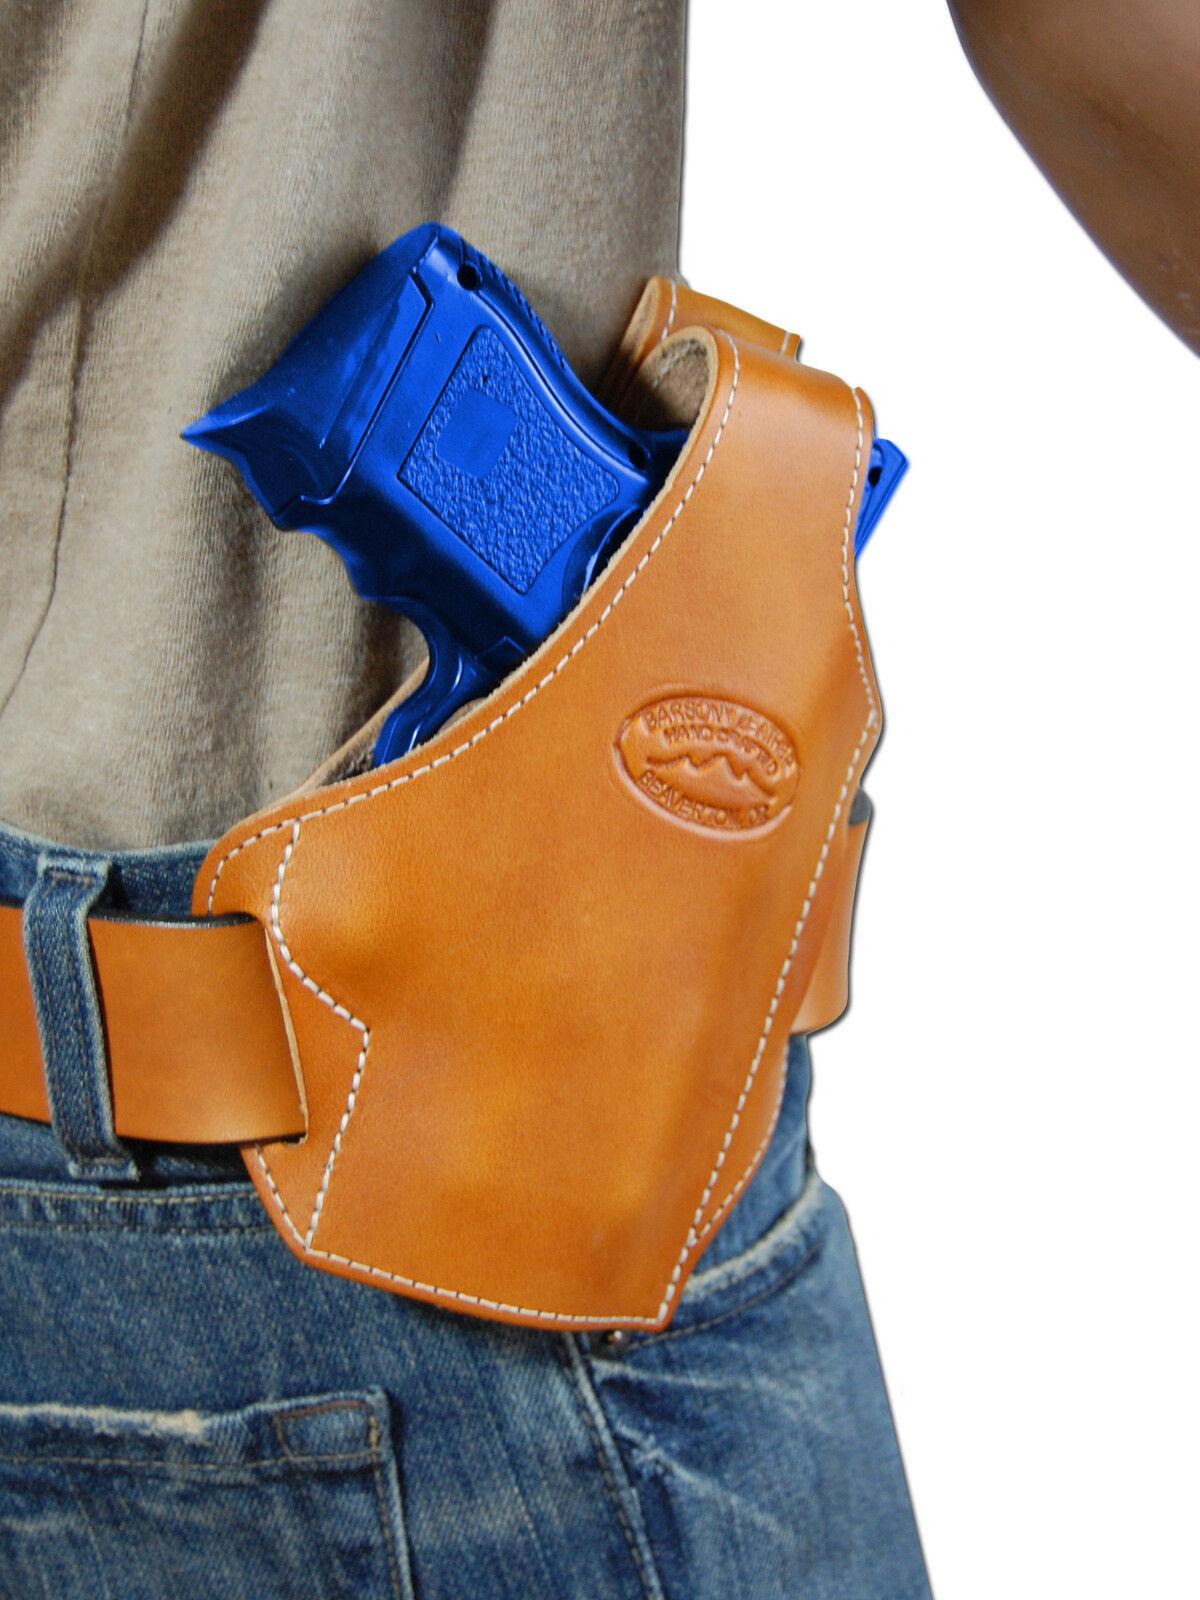 New Tan Leder Dbl Pancake Gun Holster + Dbl Leder Mag Pouch Walther Steyr Comp 9mm 40 45 75dbe6